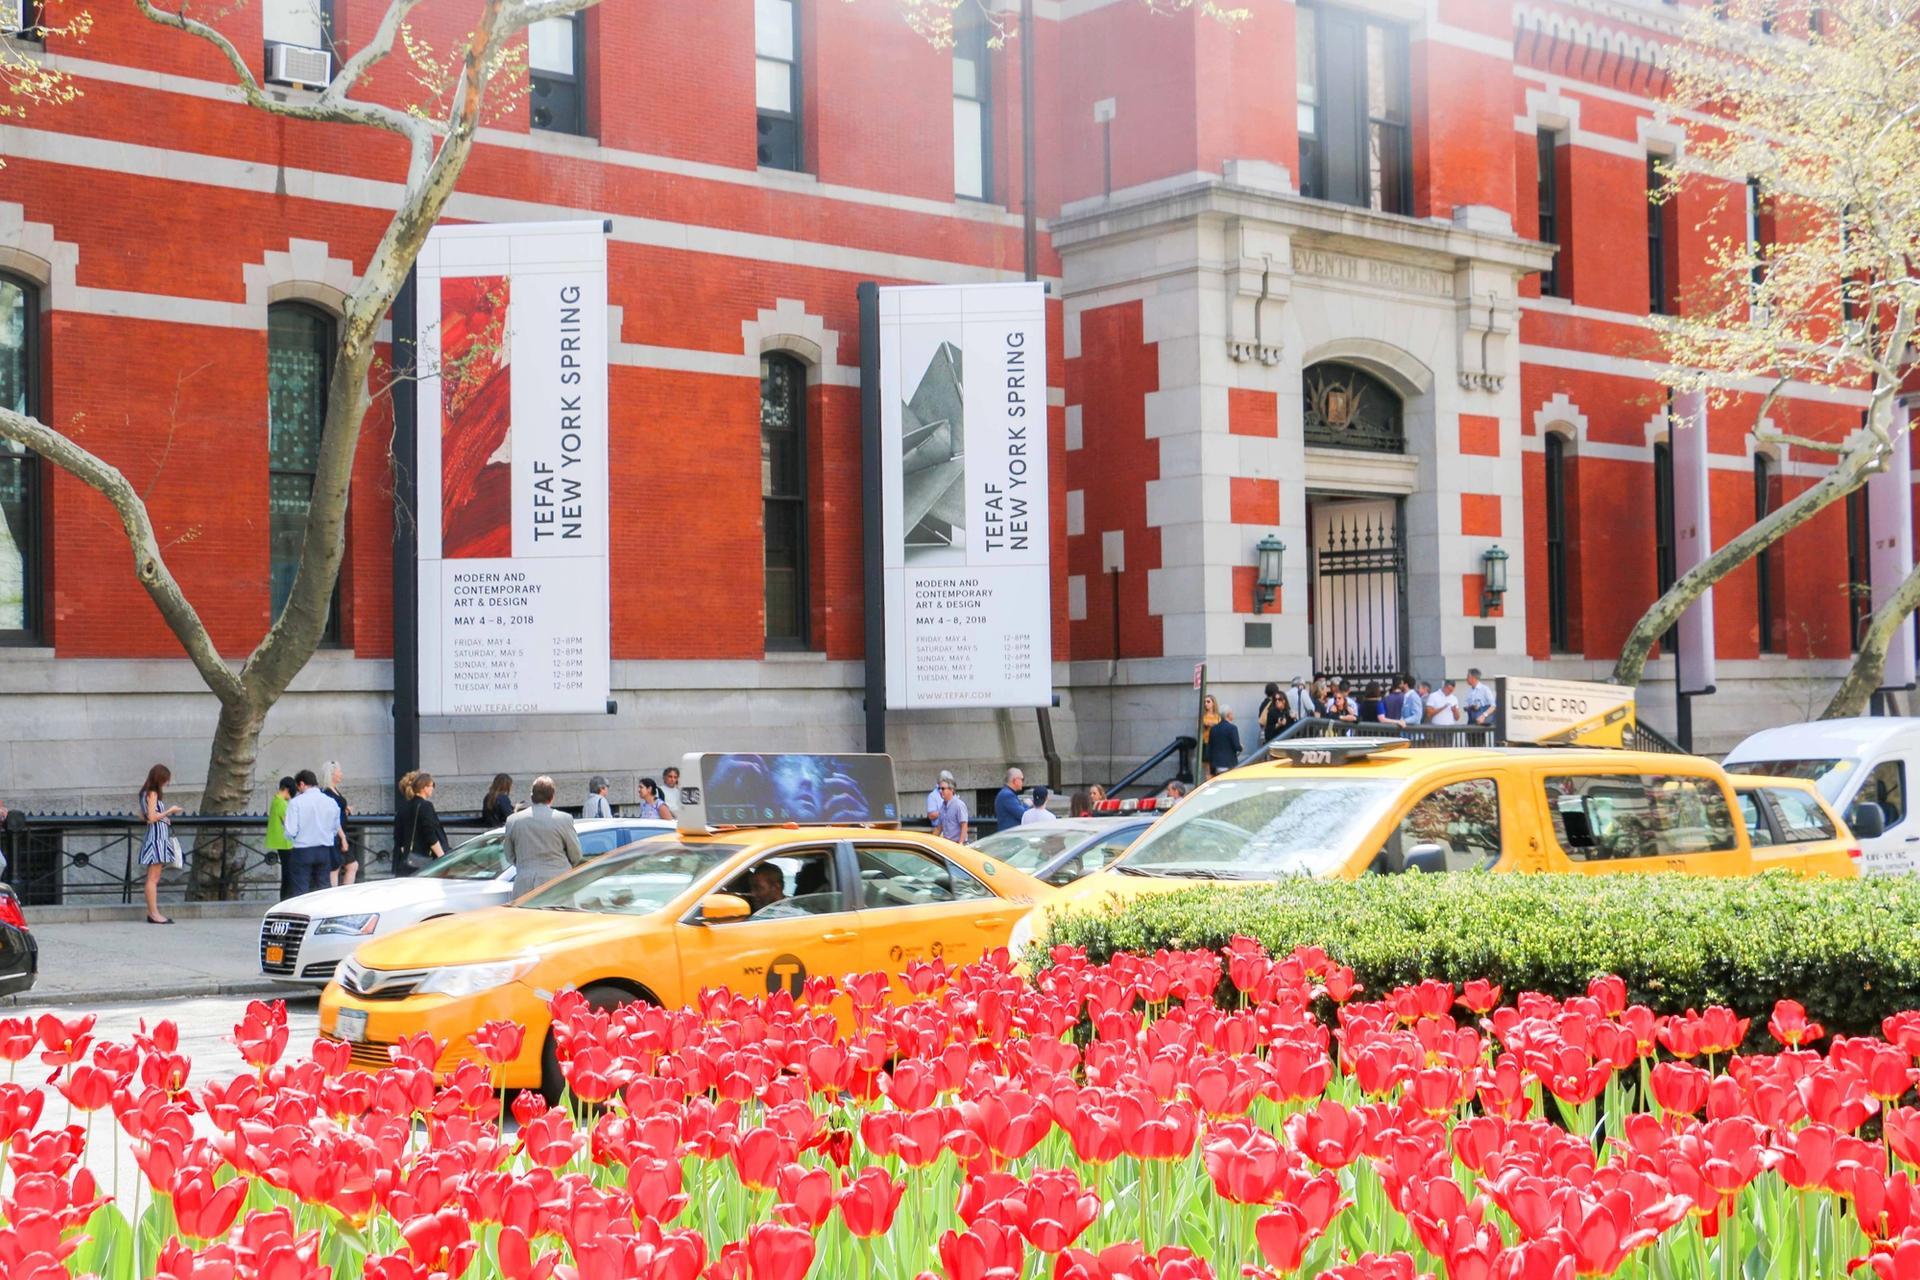 Tefaf New York Spring this year Kirsten Chilstrom